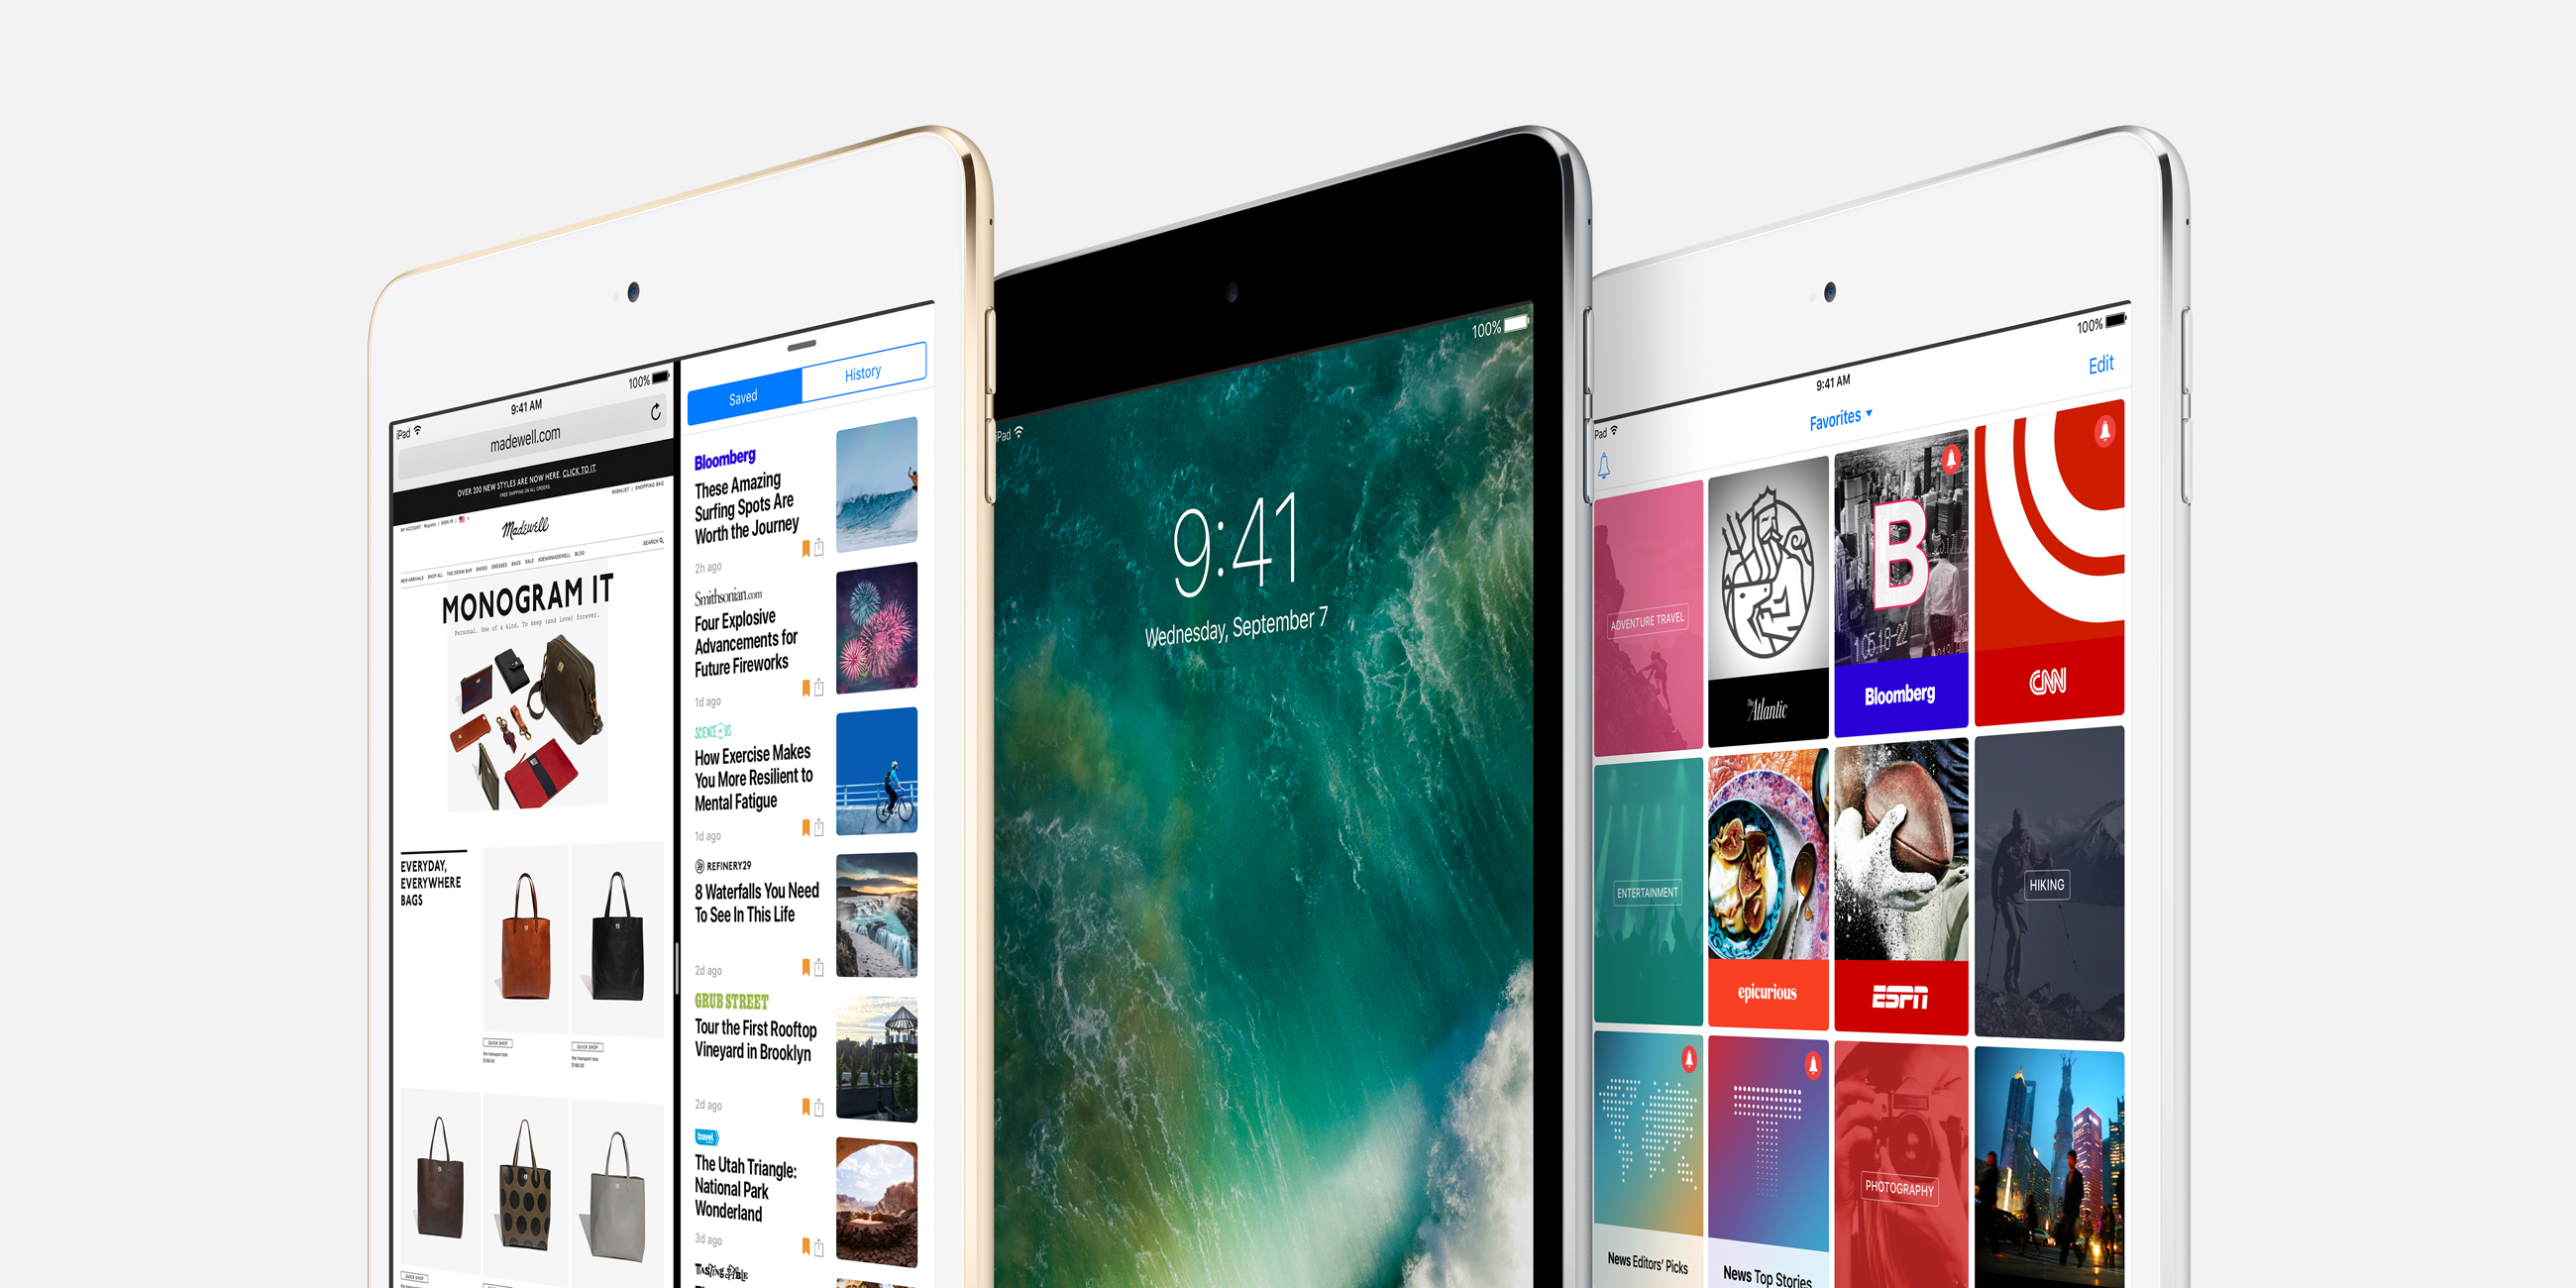 iPad mini 4 Wi-Fi 128GB on sale from $285 shipped at Best Buy (Reg. $399)